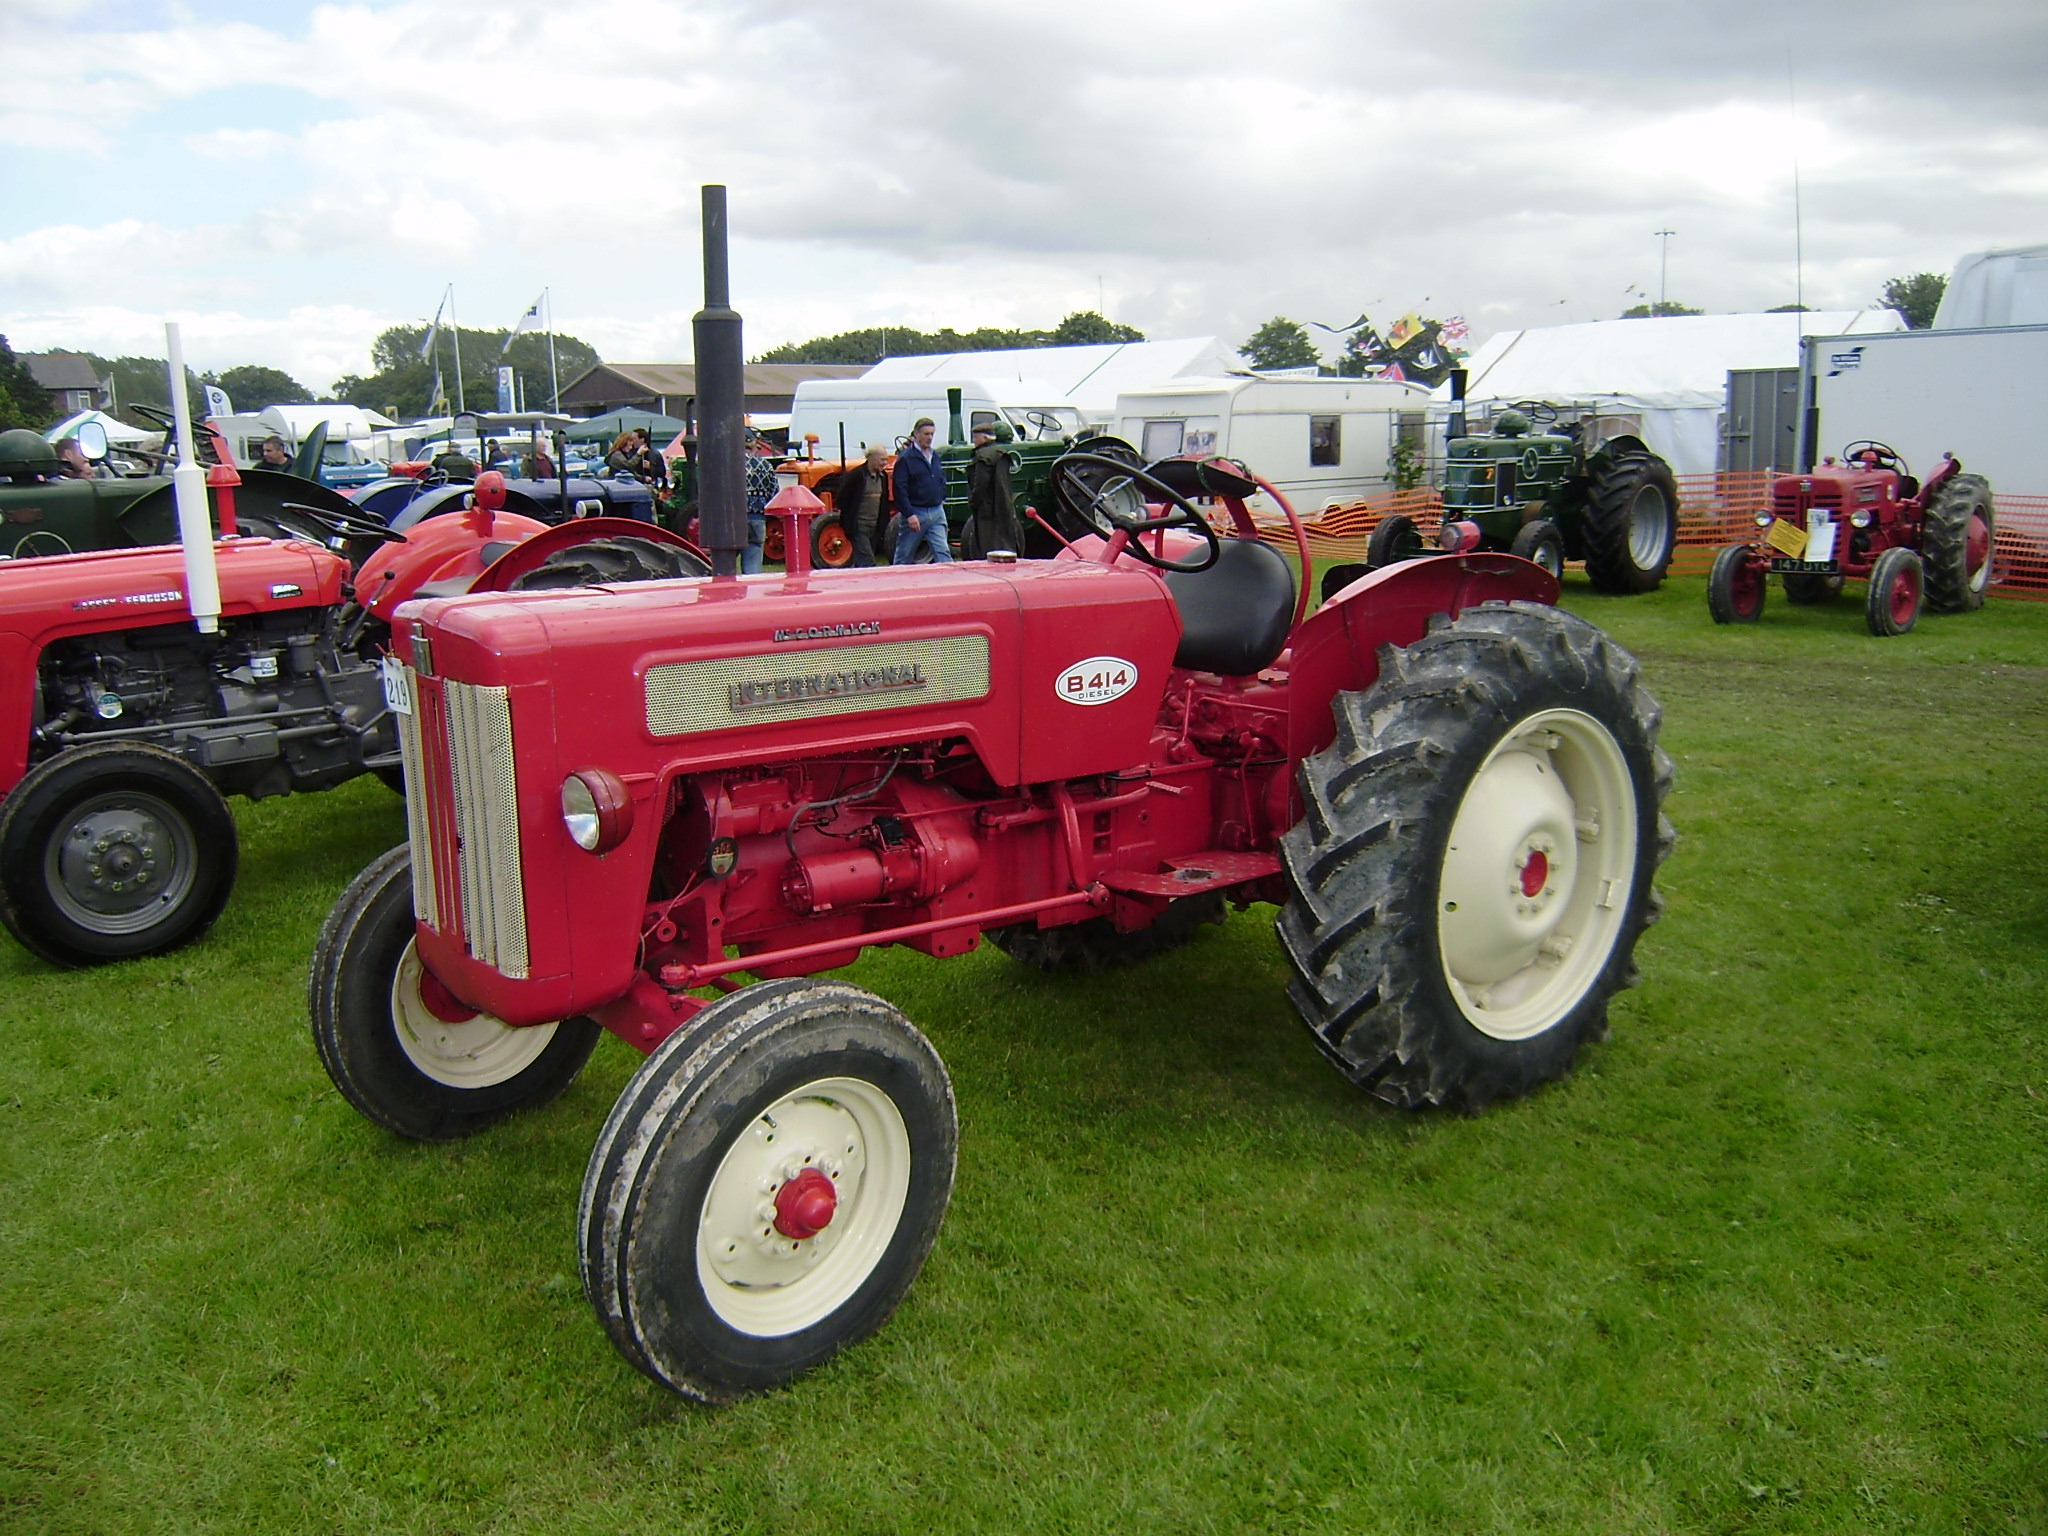 International b414 tractor construction plant wiki fandom international b414 freerunsca Images